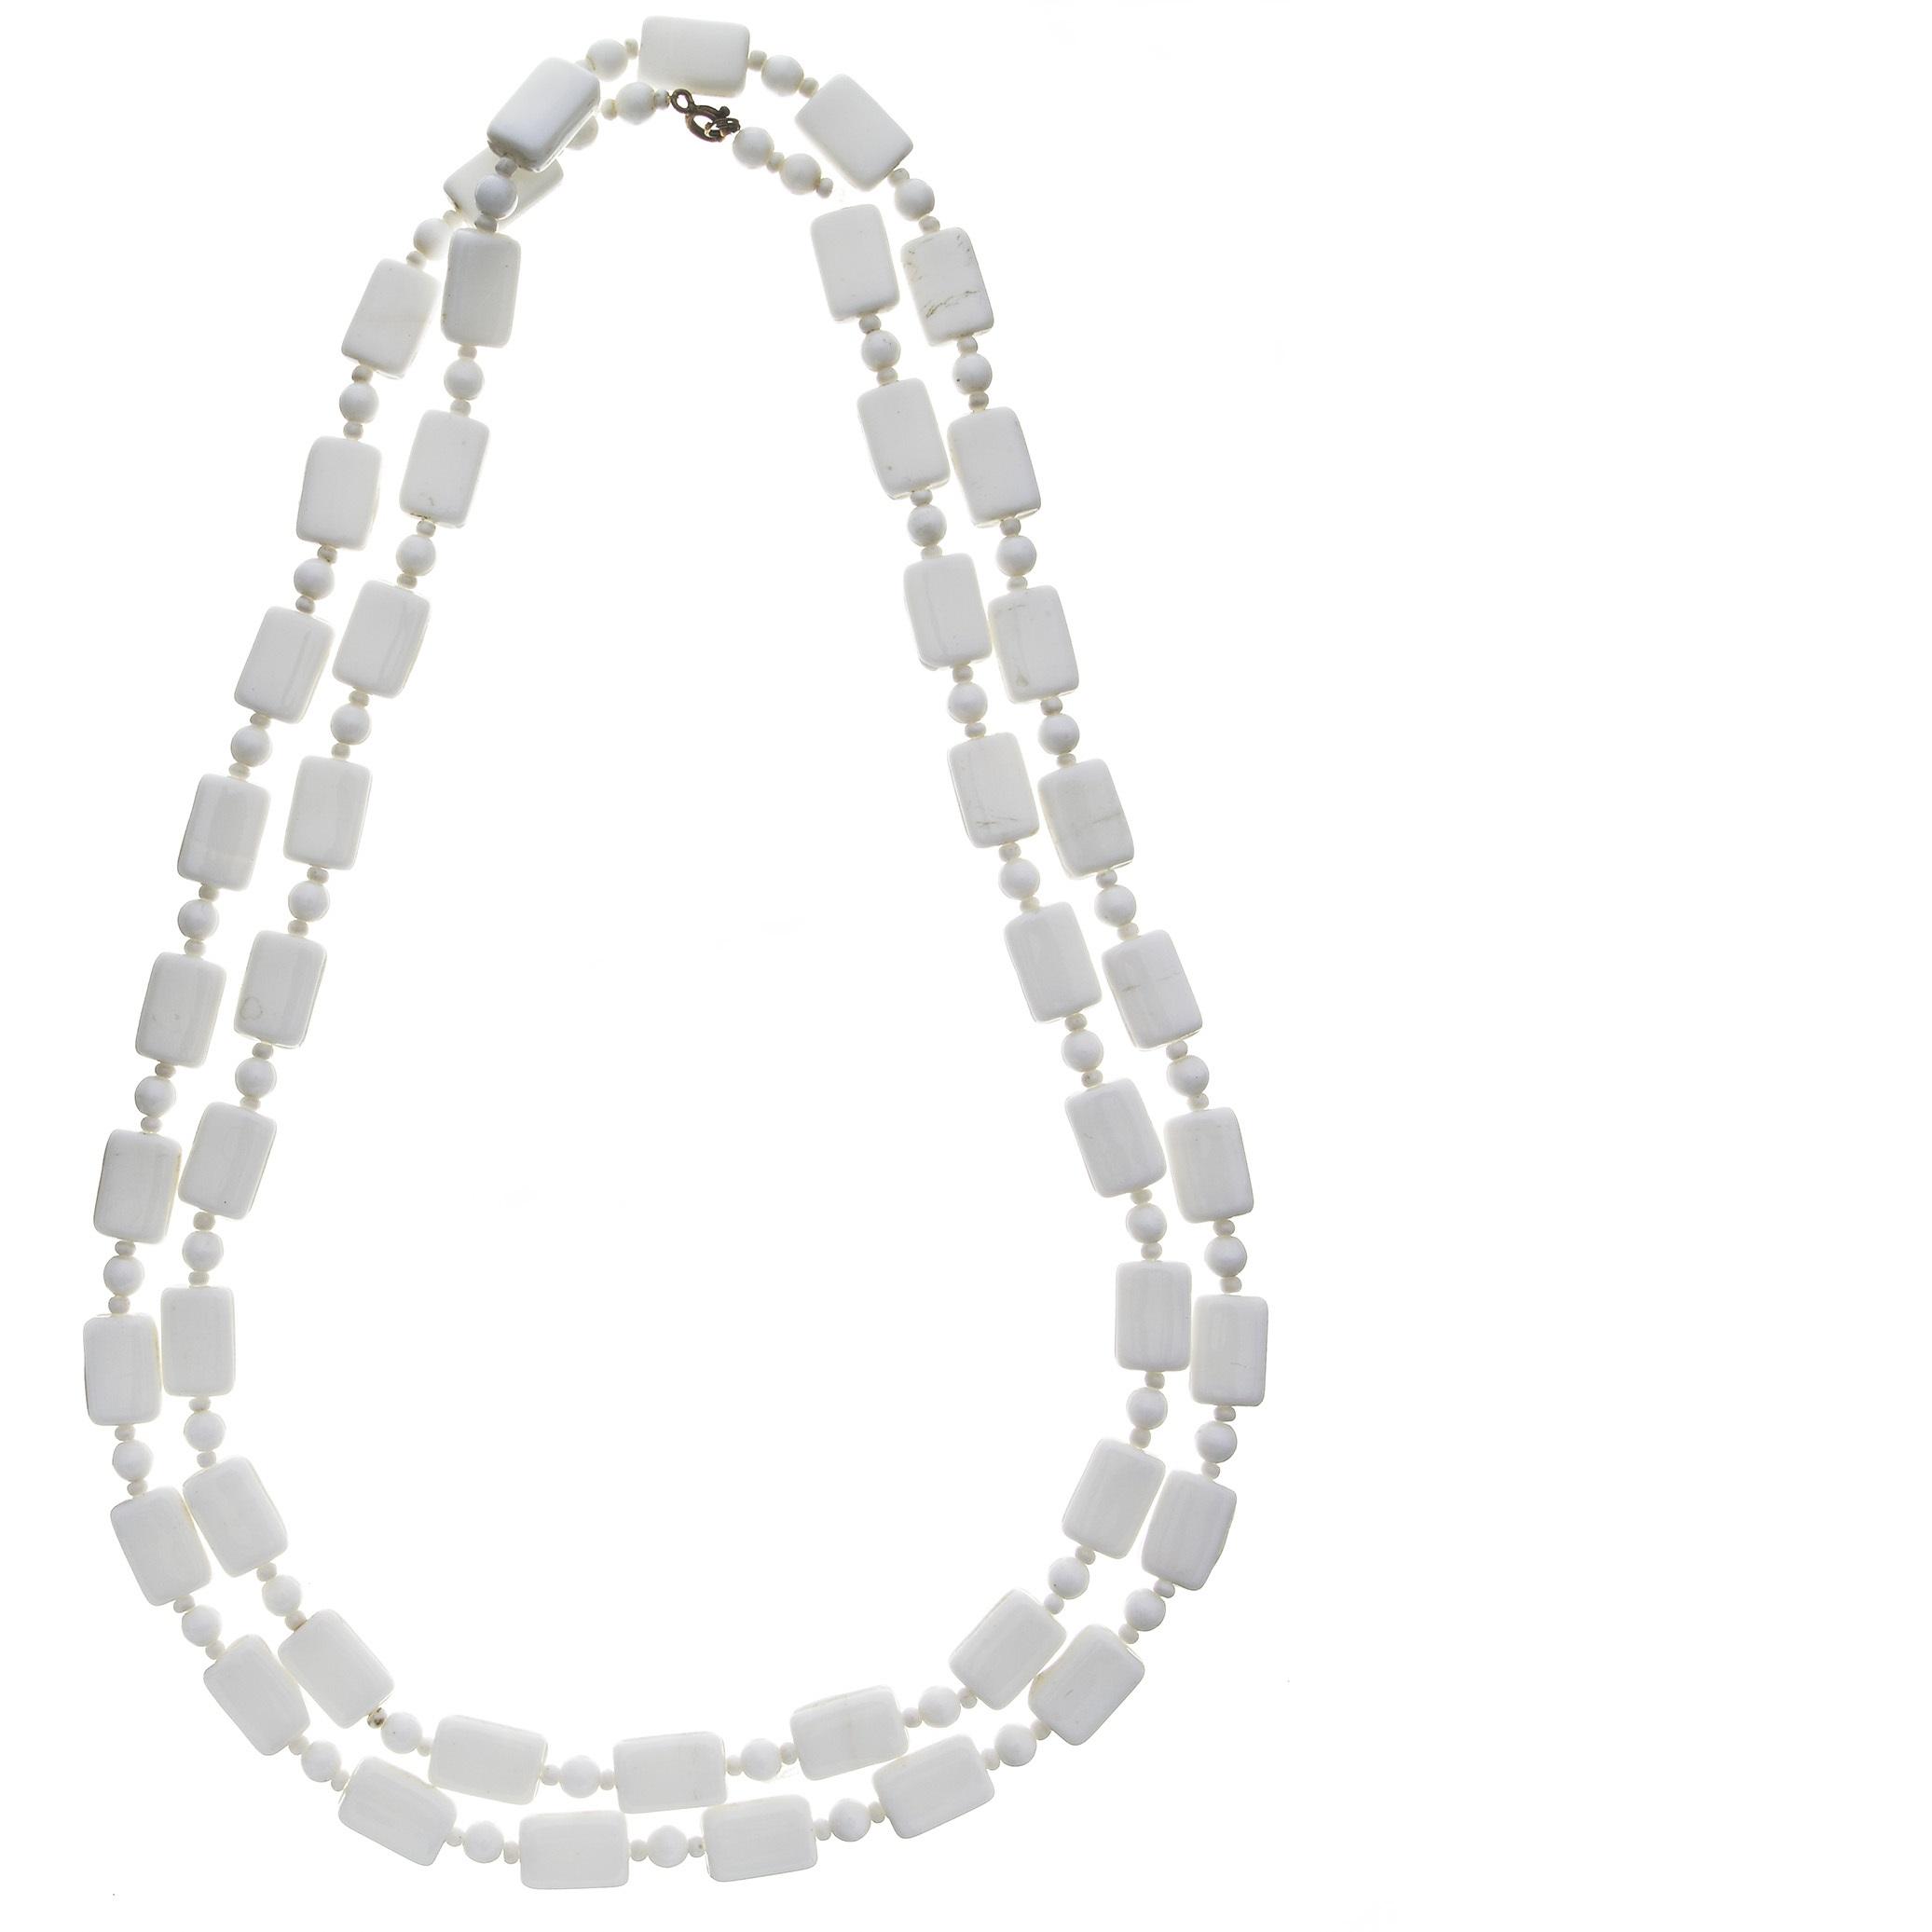 Vintage White Necklaces